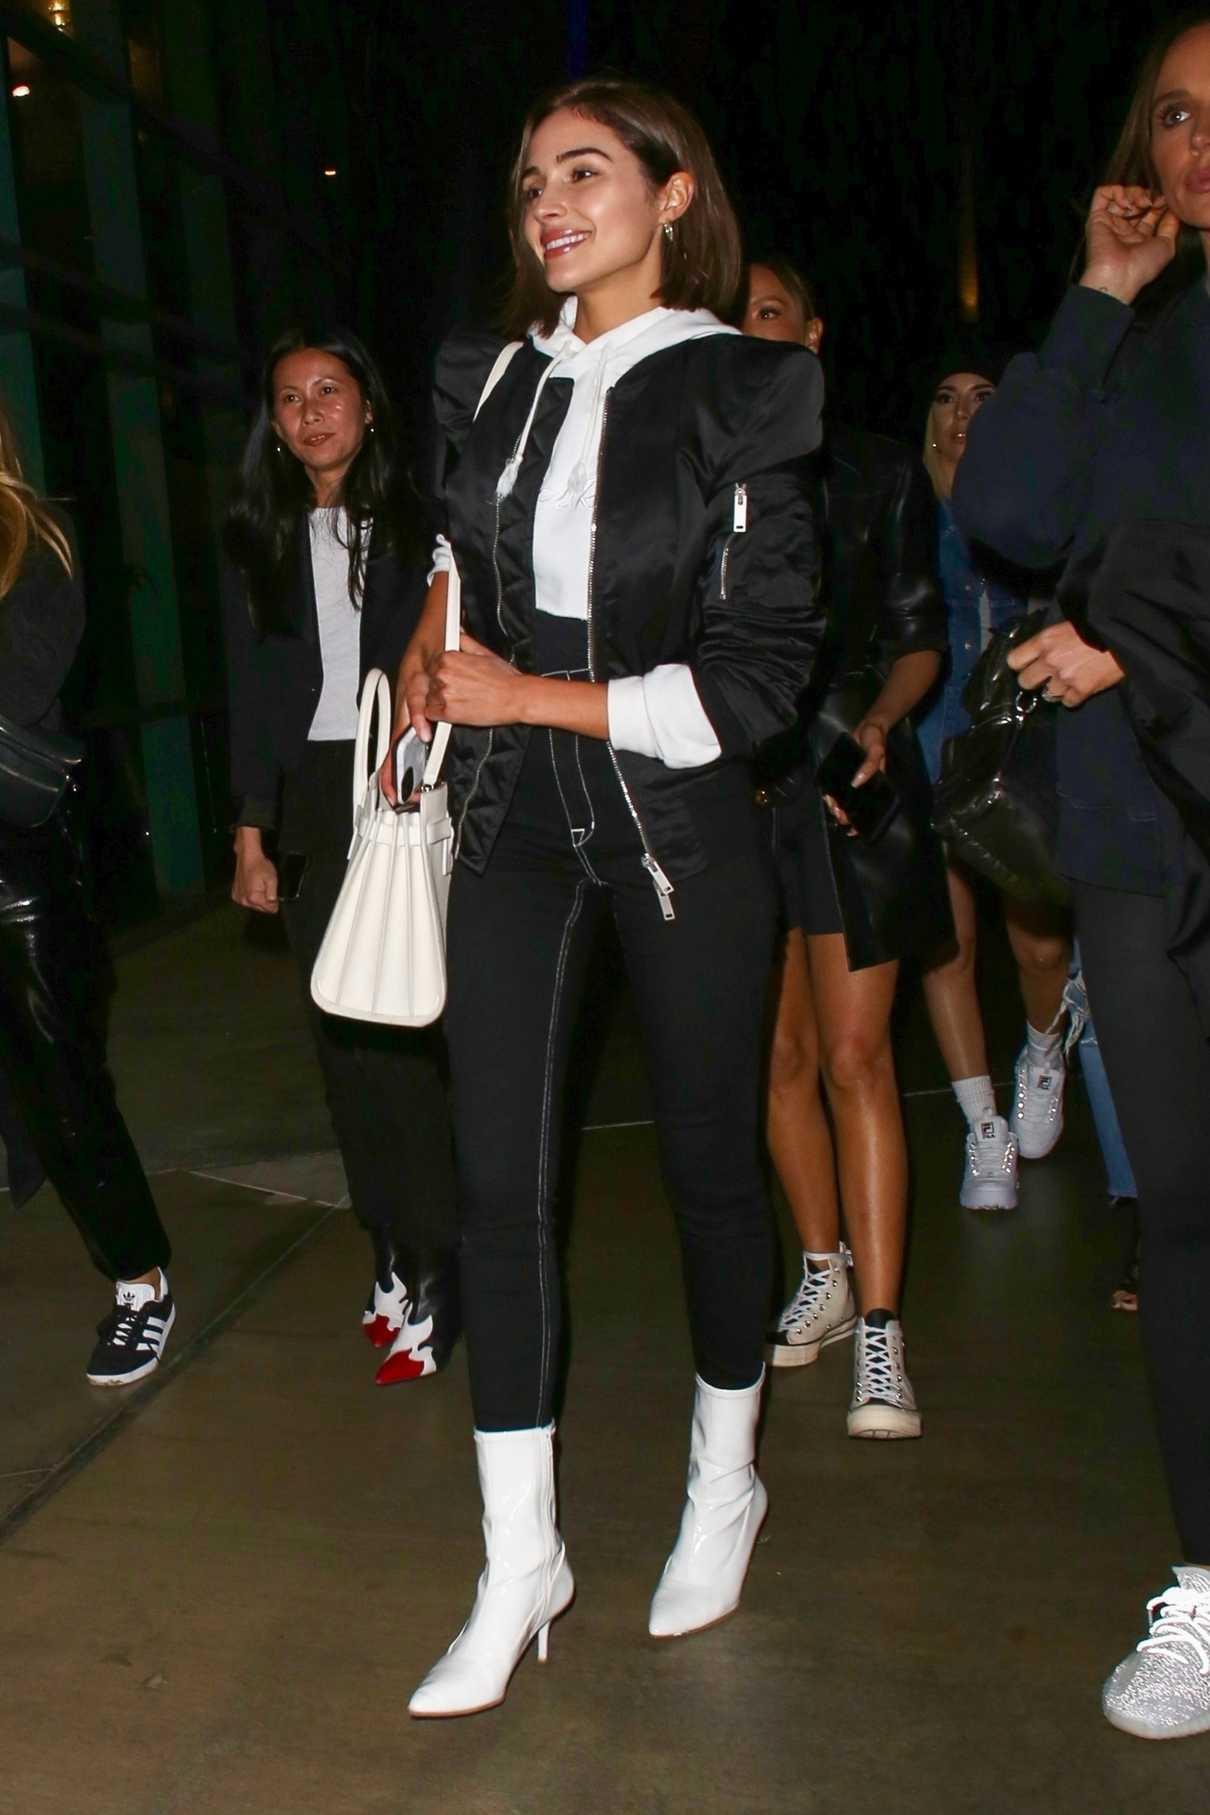 Olivia Culpo in a Black Bomber Jacket